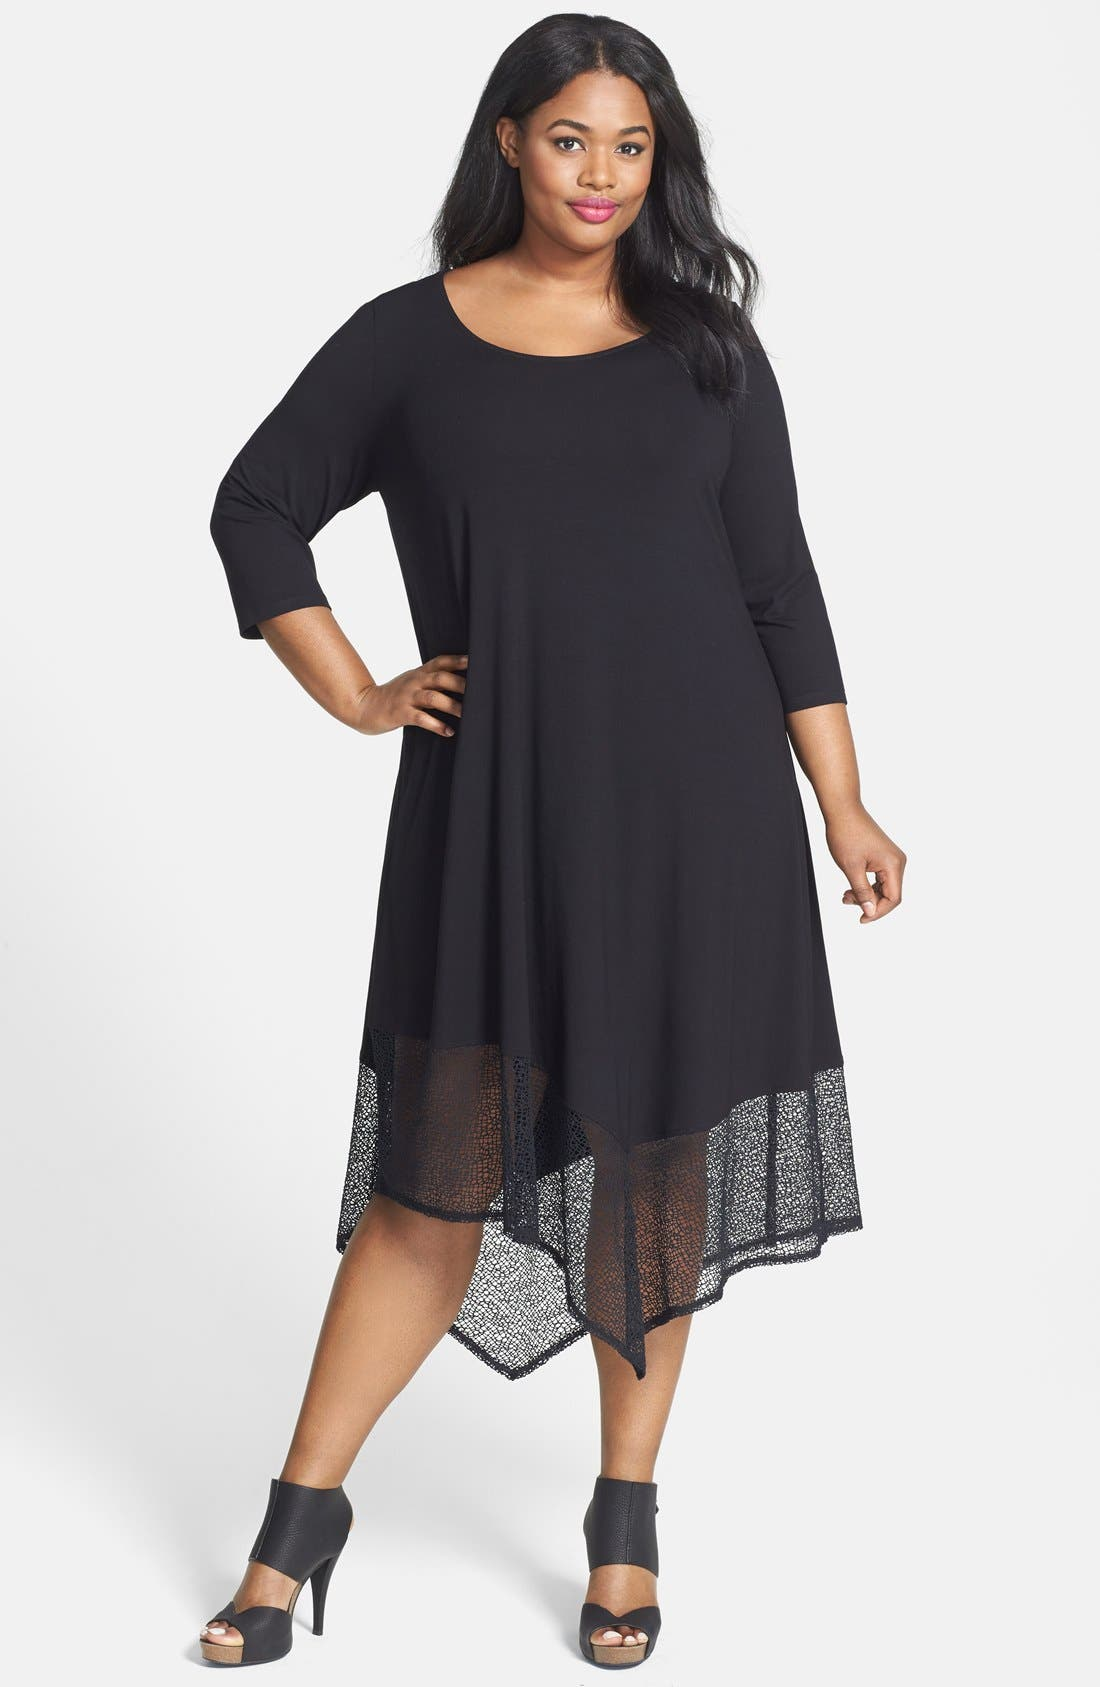 Alternate Image 1 Selected - Eileen Fisher Lace Hem Scoop Neck Jersey Shift Dress (Plus Size)